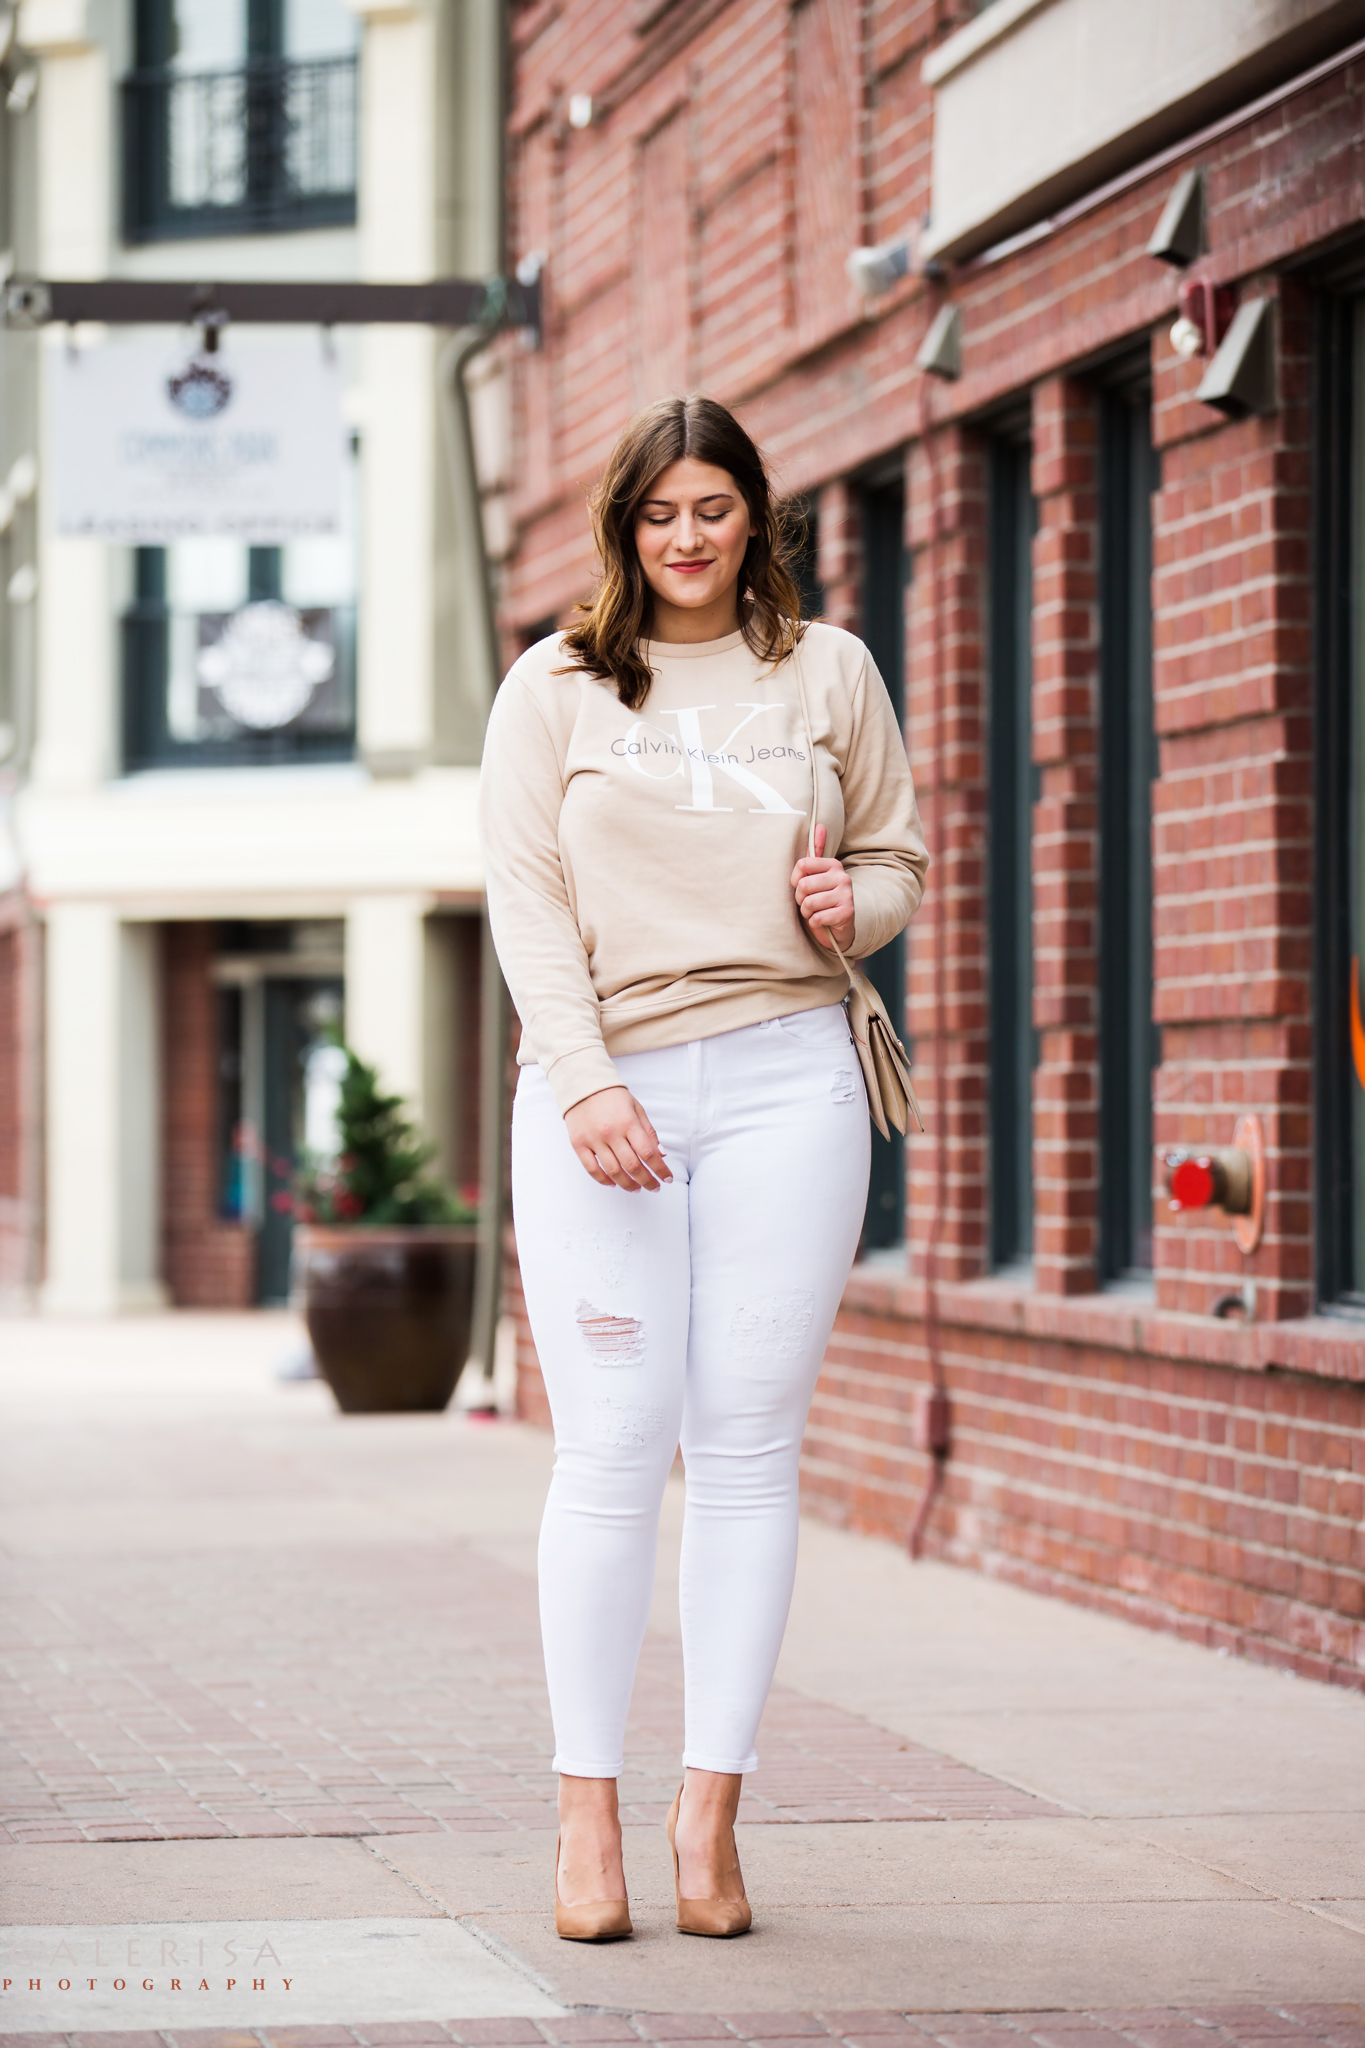 Raeann-Langas-Denver-Fashion-Blogger--white-pants-beige-sweater-GaleRisa-Photography-2016-23